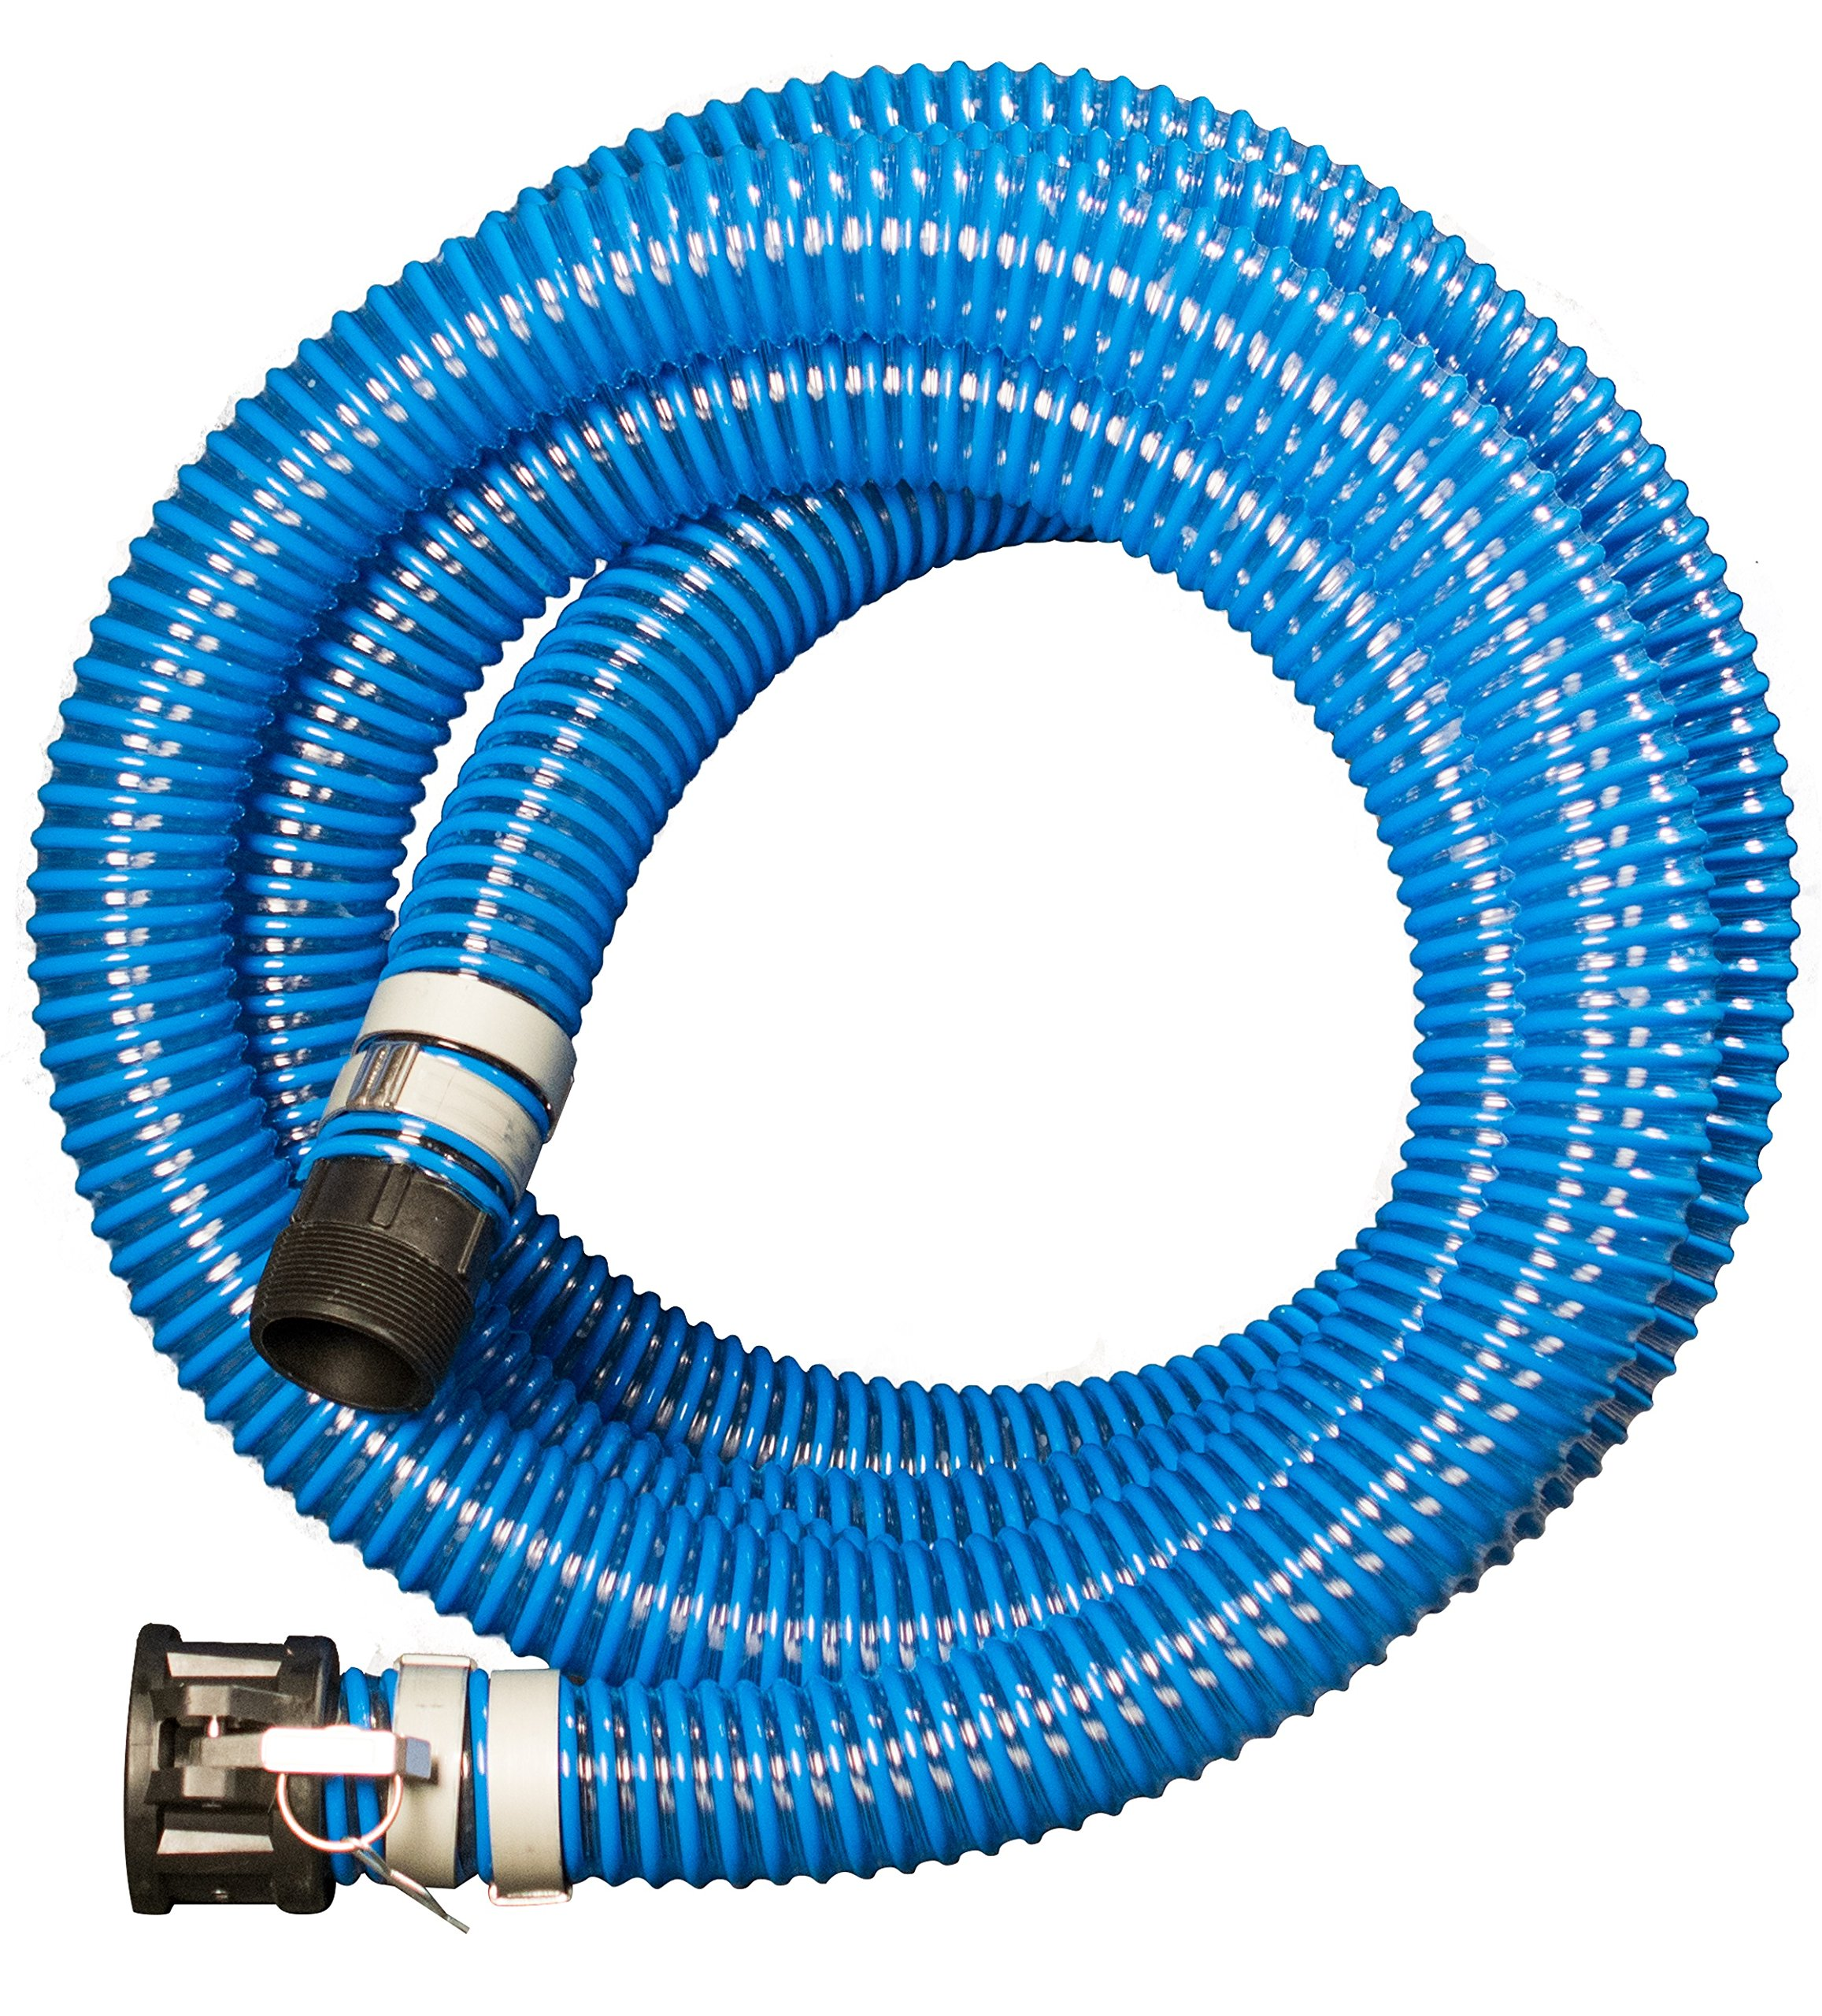 Apache 98106503 PVC Suction Poly CX King Nipple Hose, 40 psi, 2'' Inside Diameter, Blue by Apache